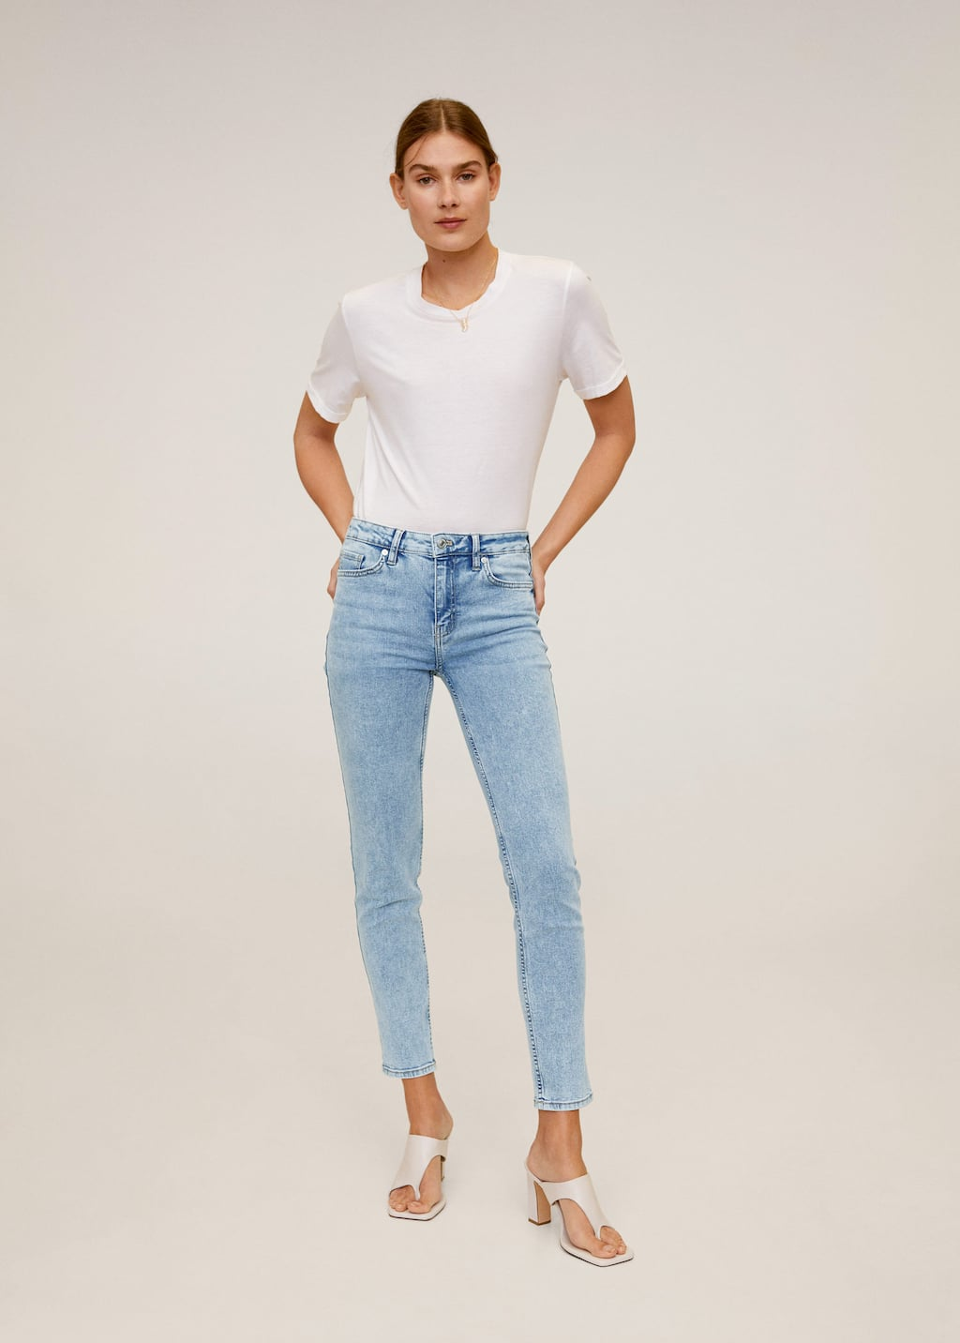 Jeans Skinny Sculpt Mujer Mango Espana